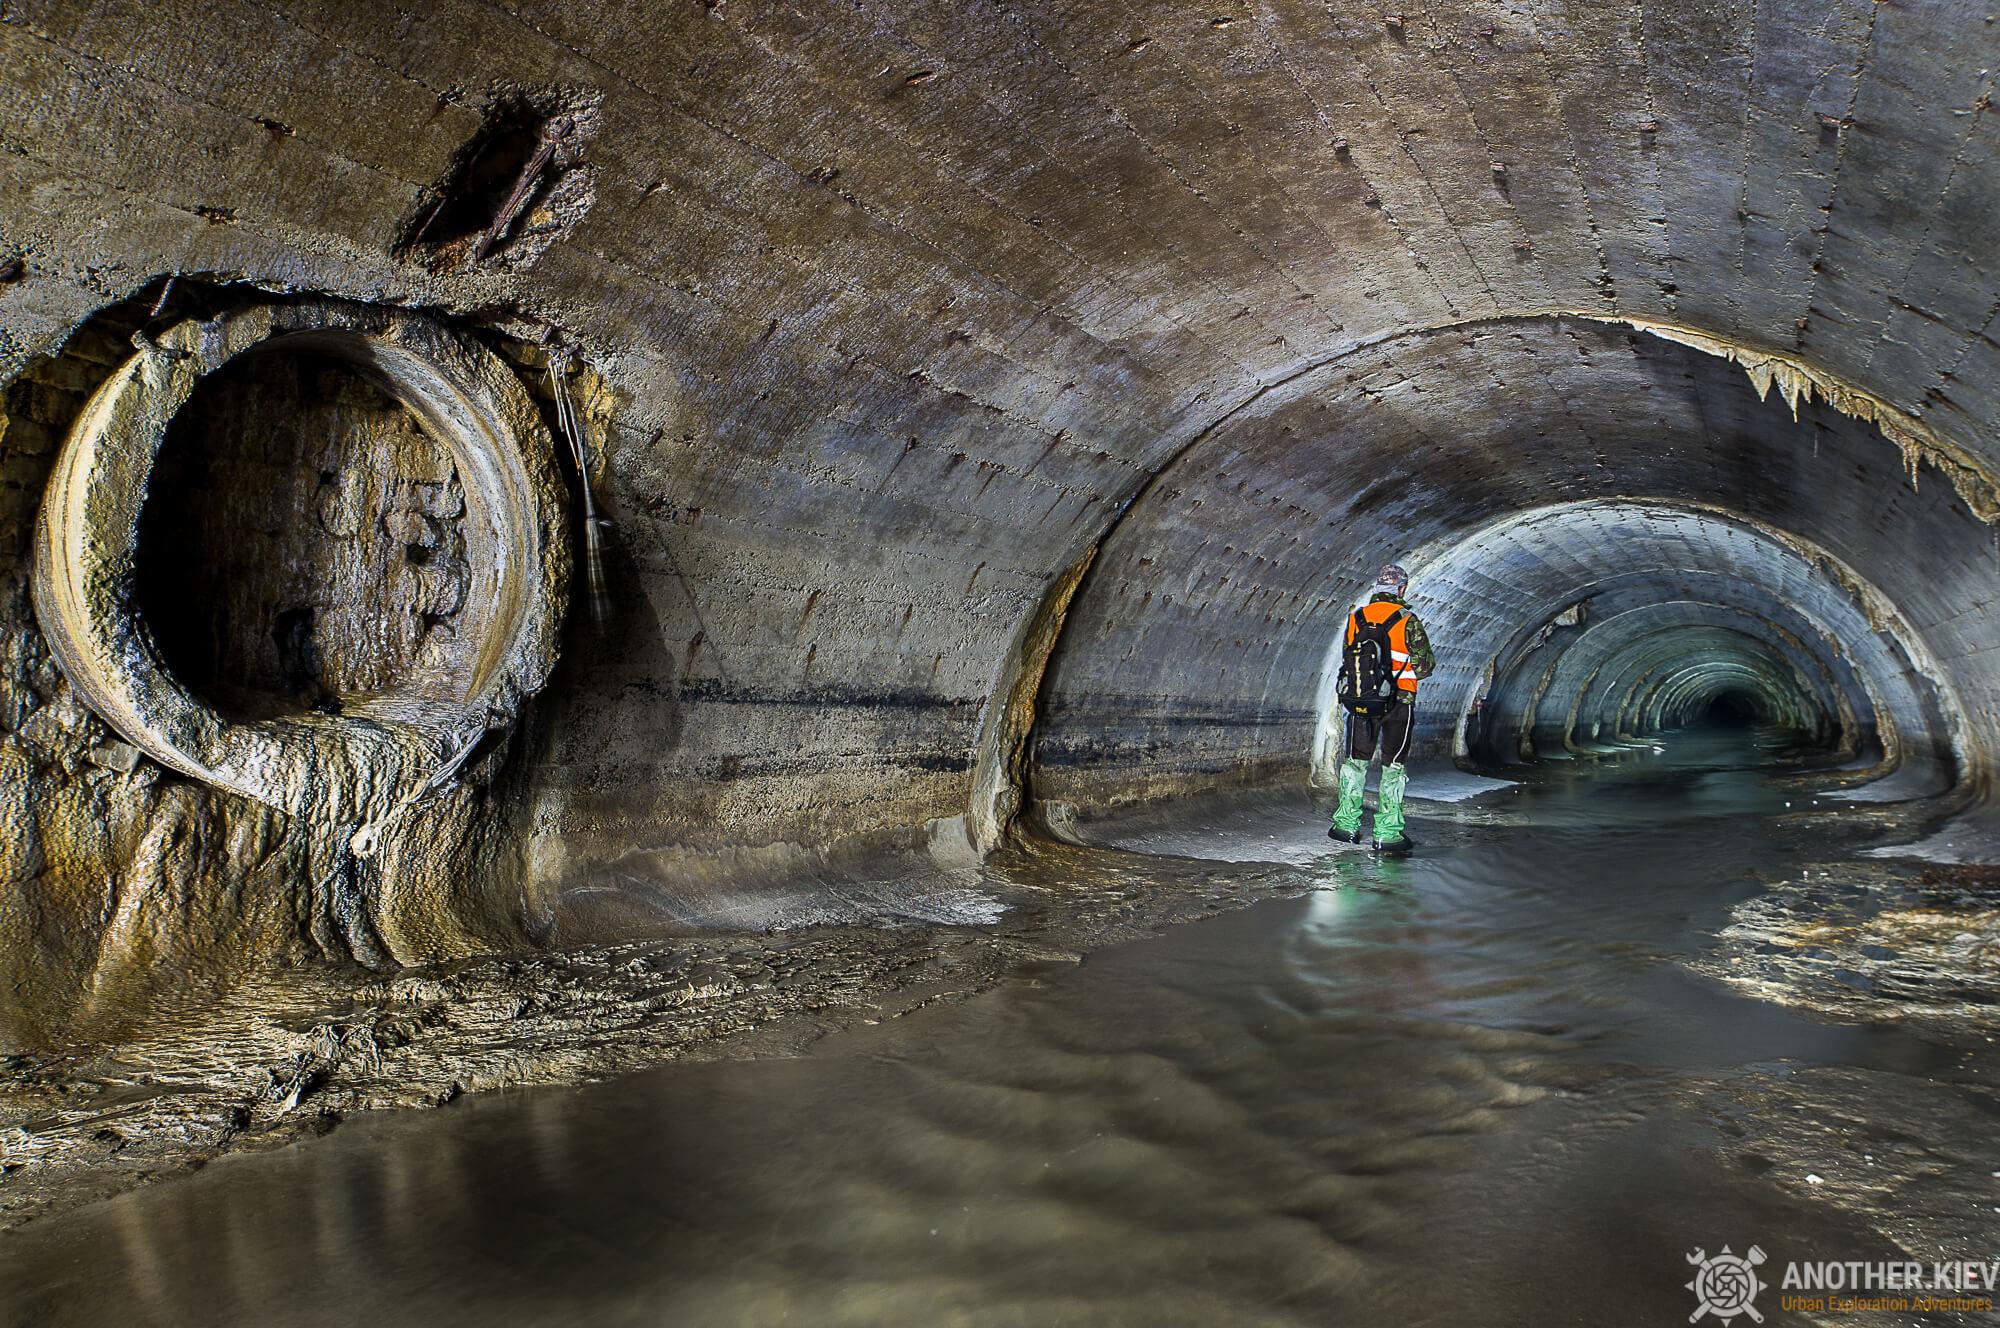 tunnel under city center of kiev suburbs